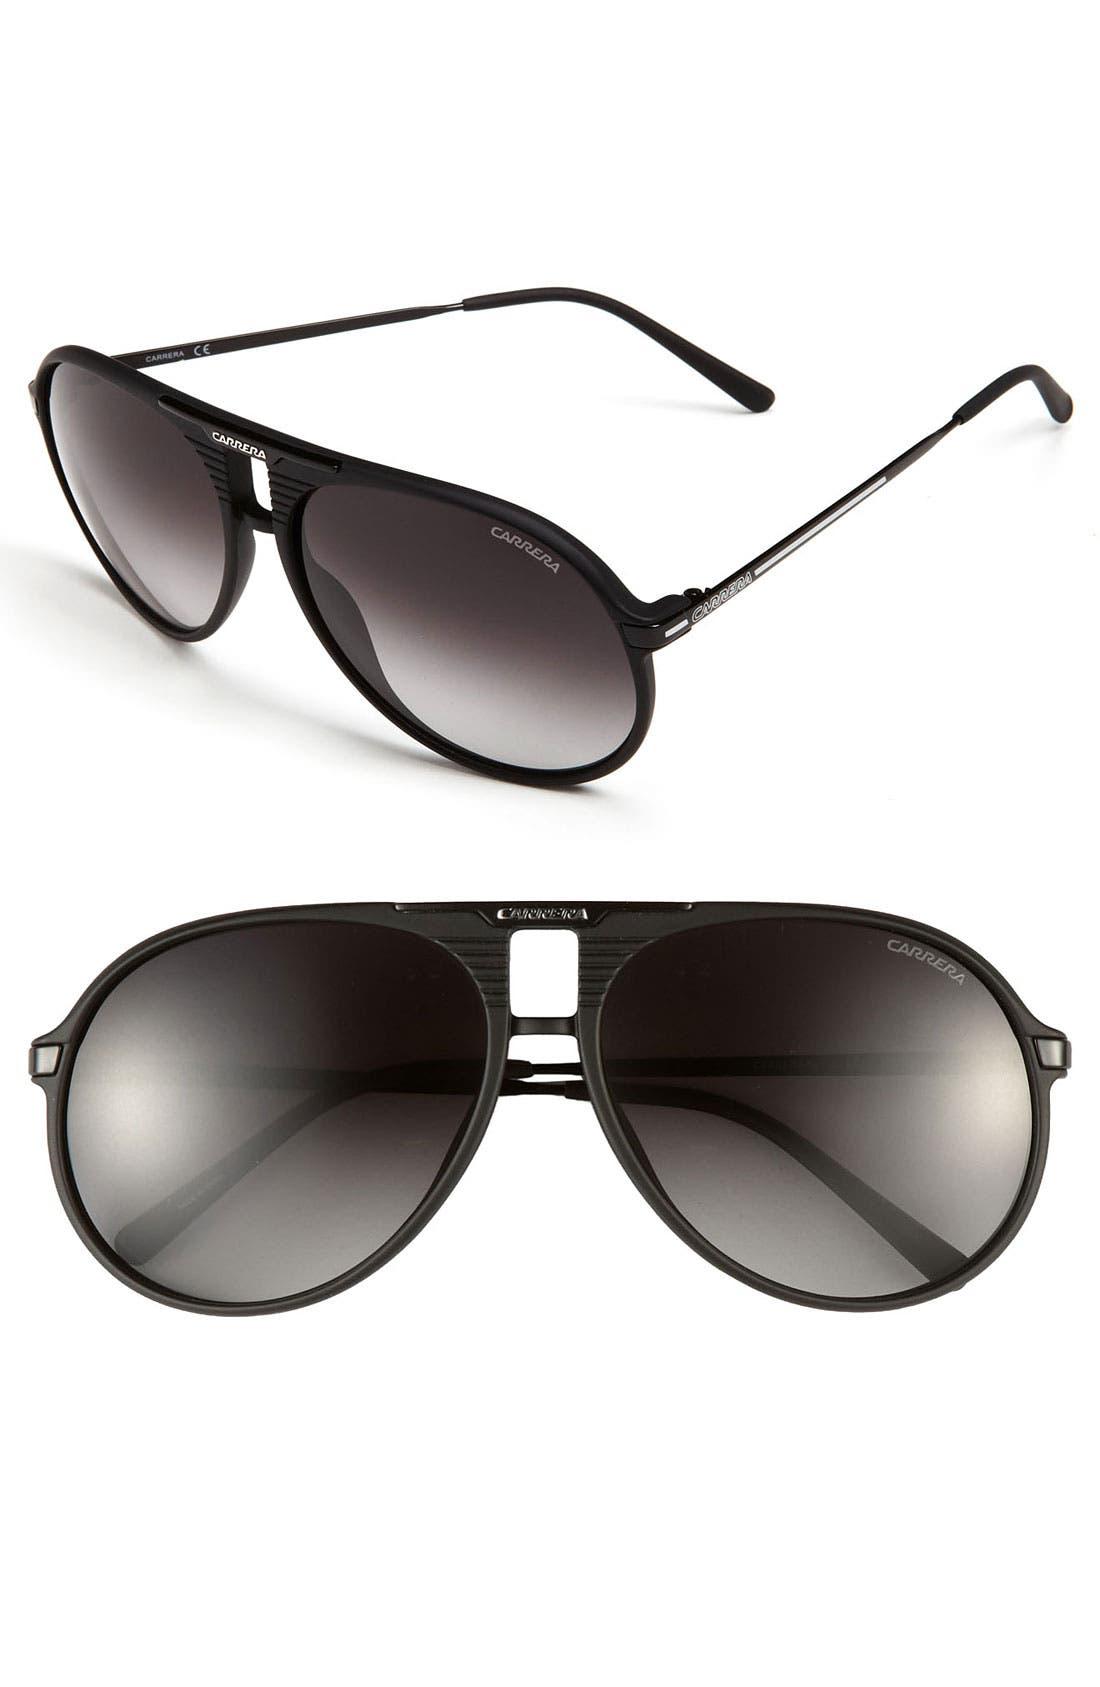 Alternate Image 1 Selected - Carrera Eyewear 60mm Sunglasses